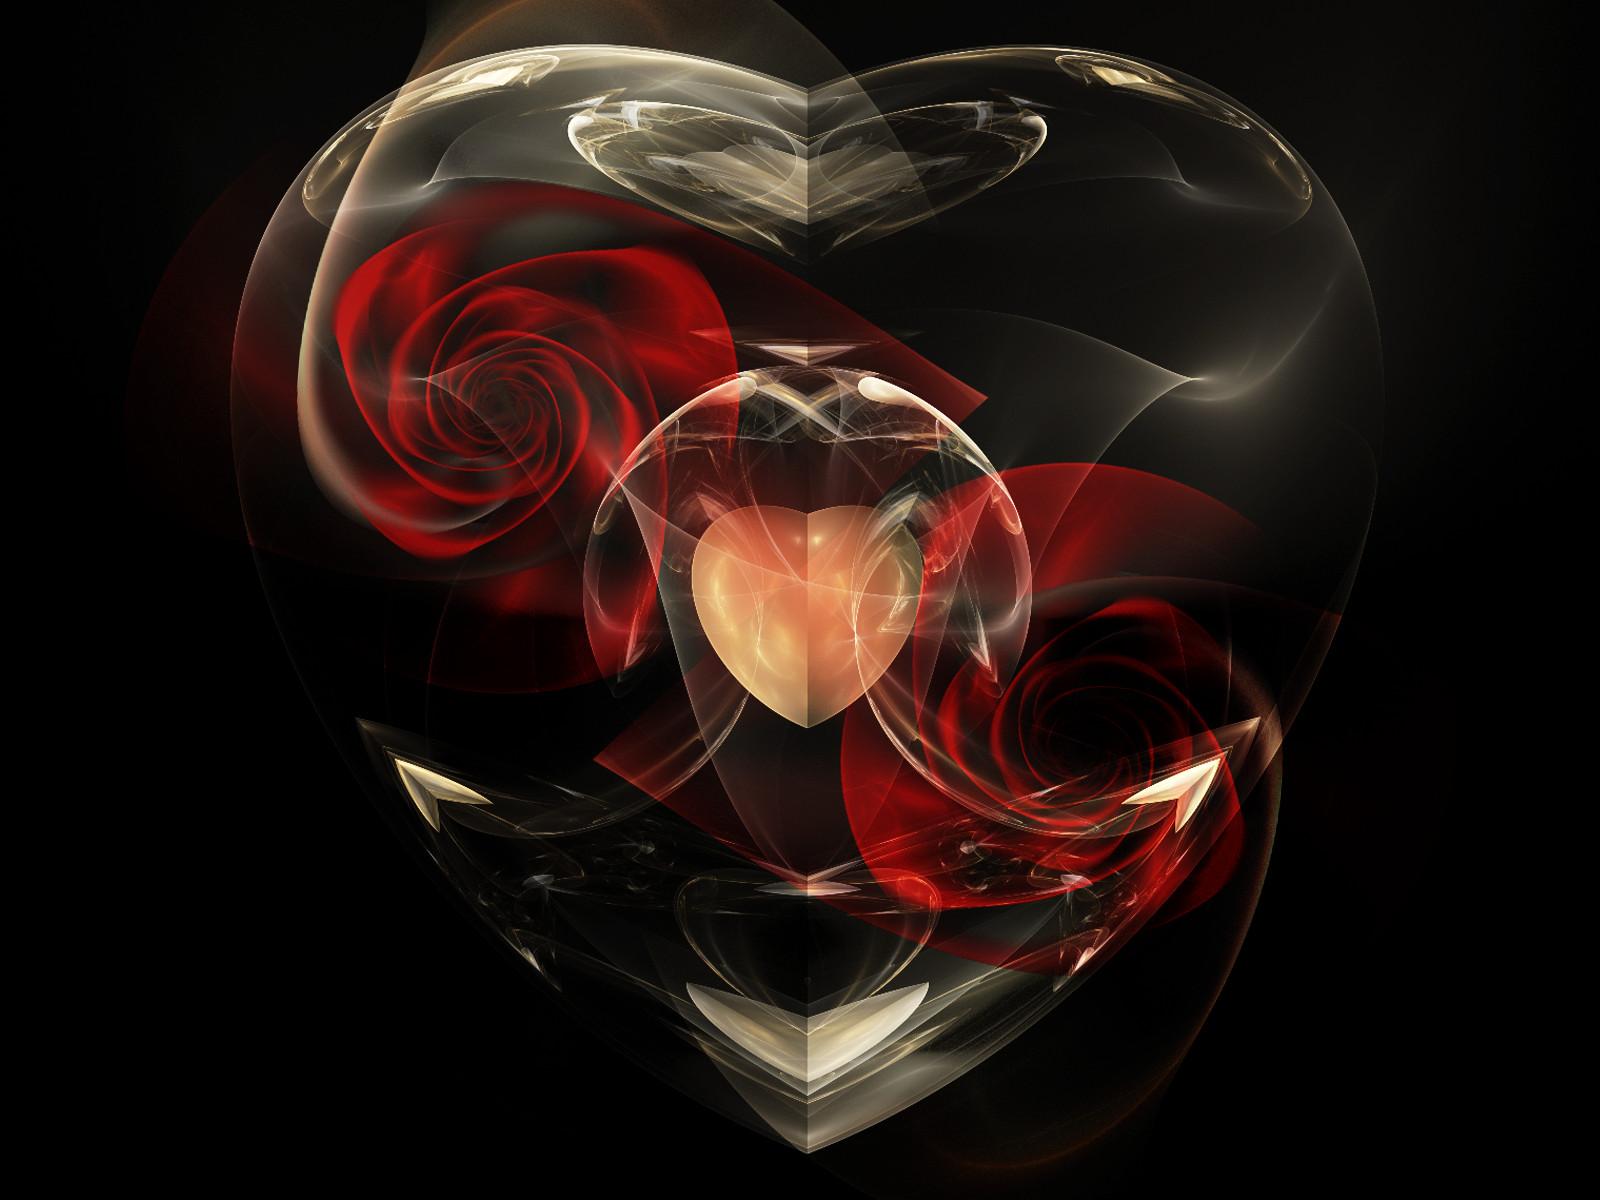 Precious Love by Joe-Maccer